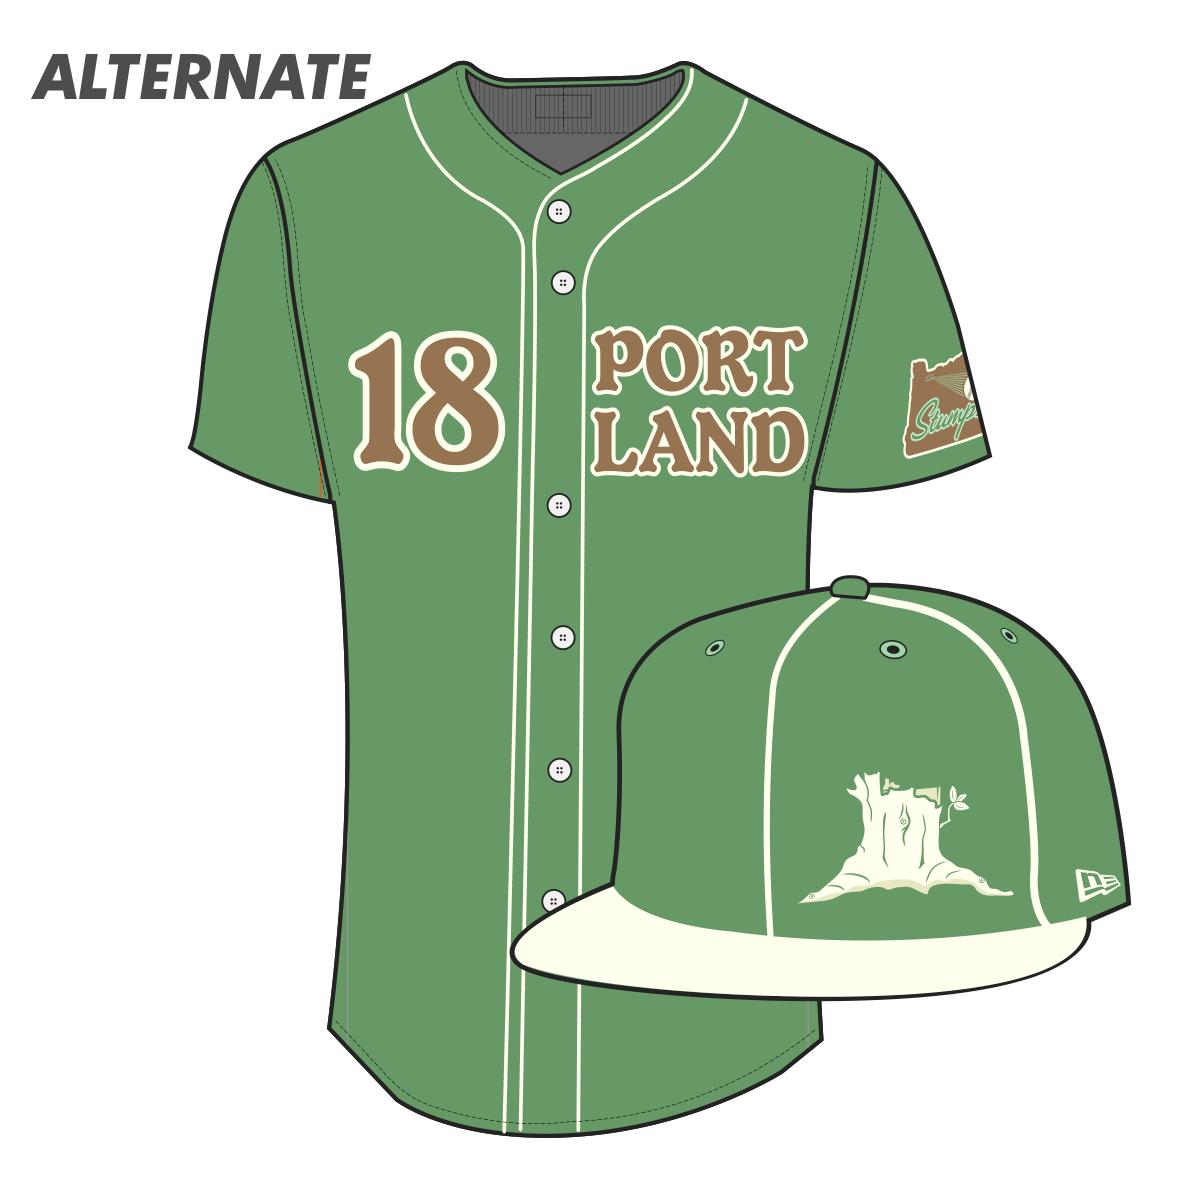 alternate jersey.png